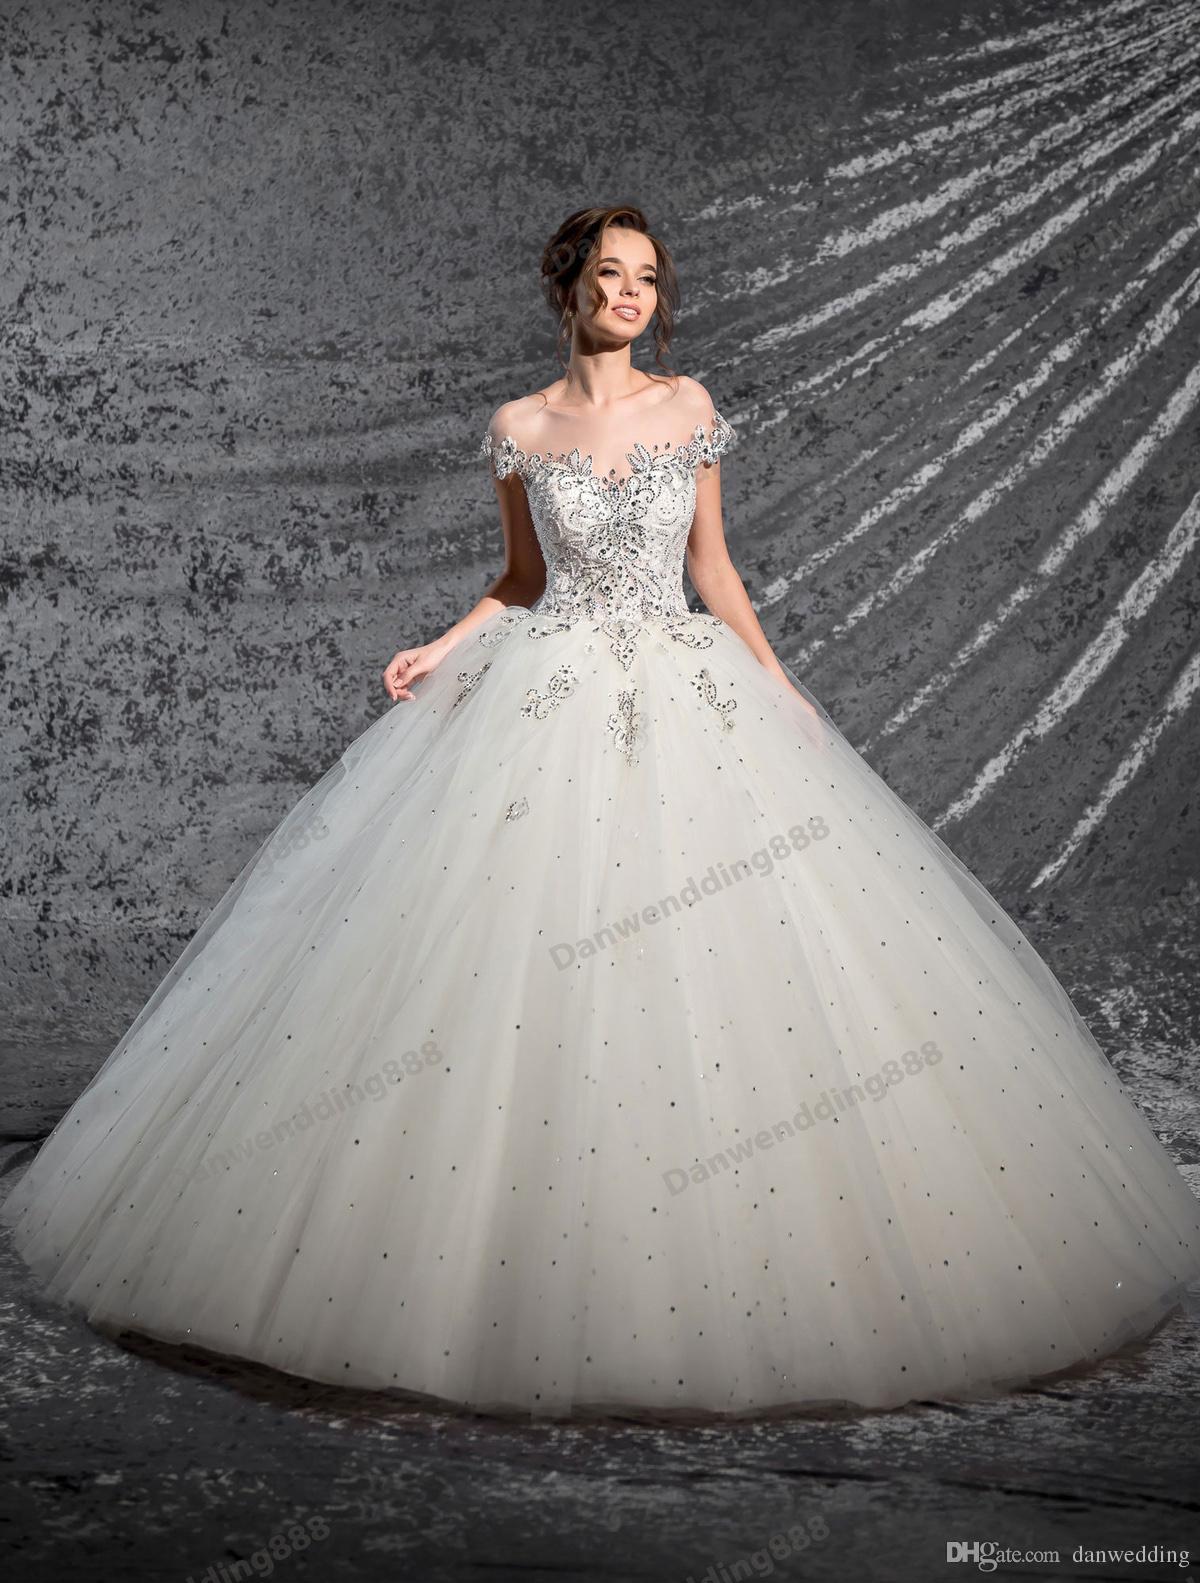 Beauty Ivory Tulle Off Shoulder Applique A-Line Wedding Dresses Bridal Pageant Dresses Wedding Attire Dresses Custom Size 2-16 ZW606003